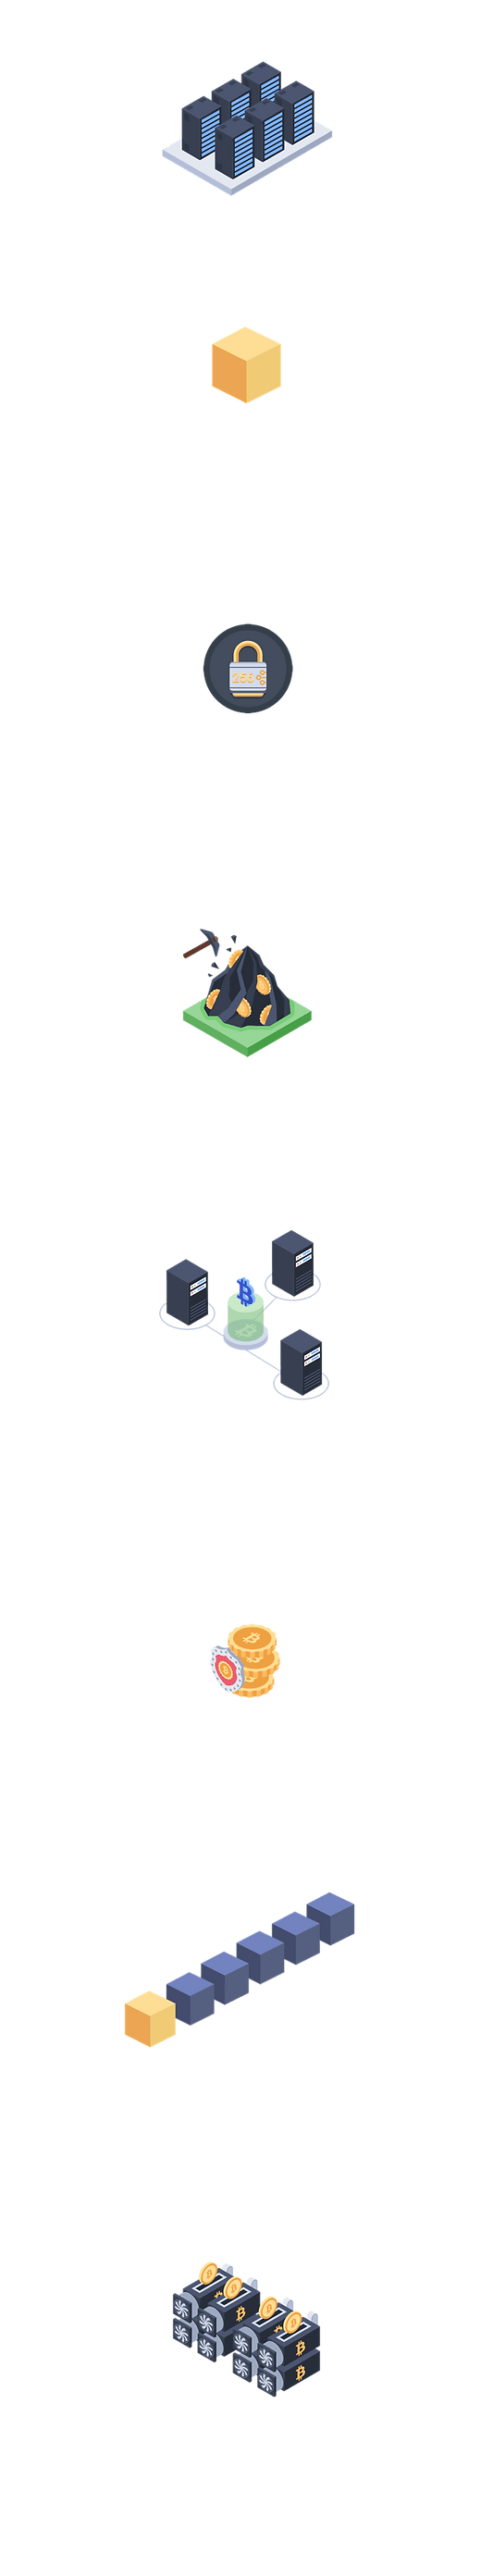 FR-Mobile-mining.png